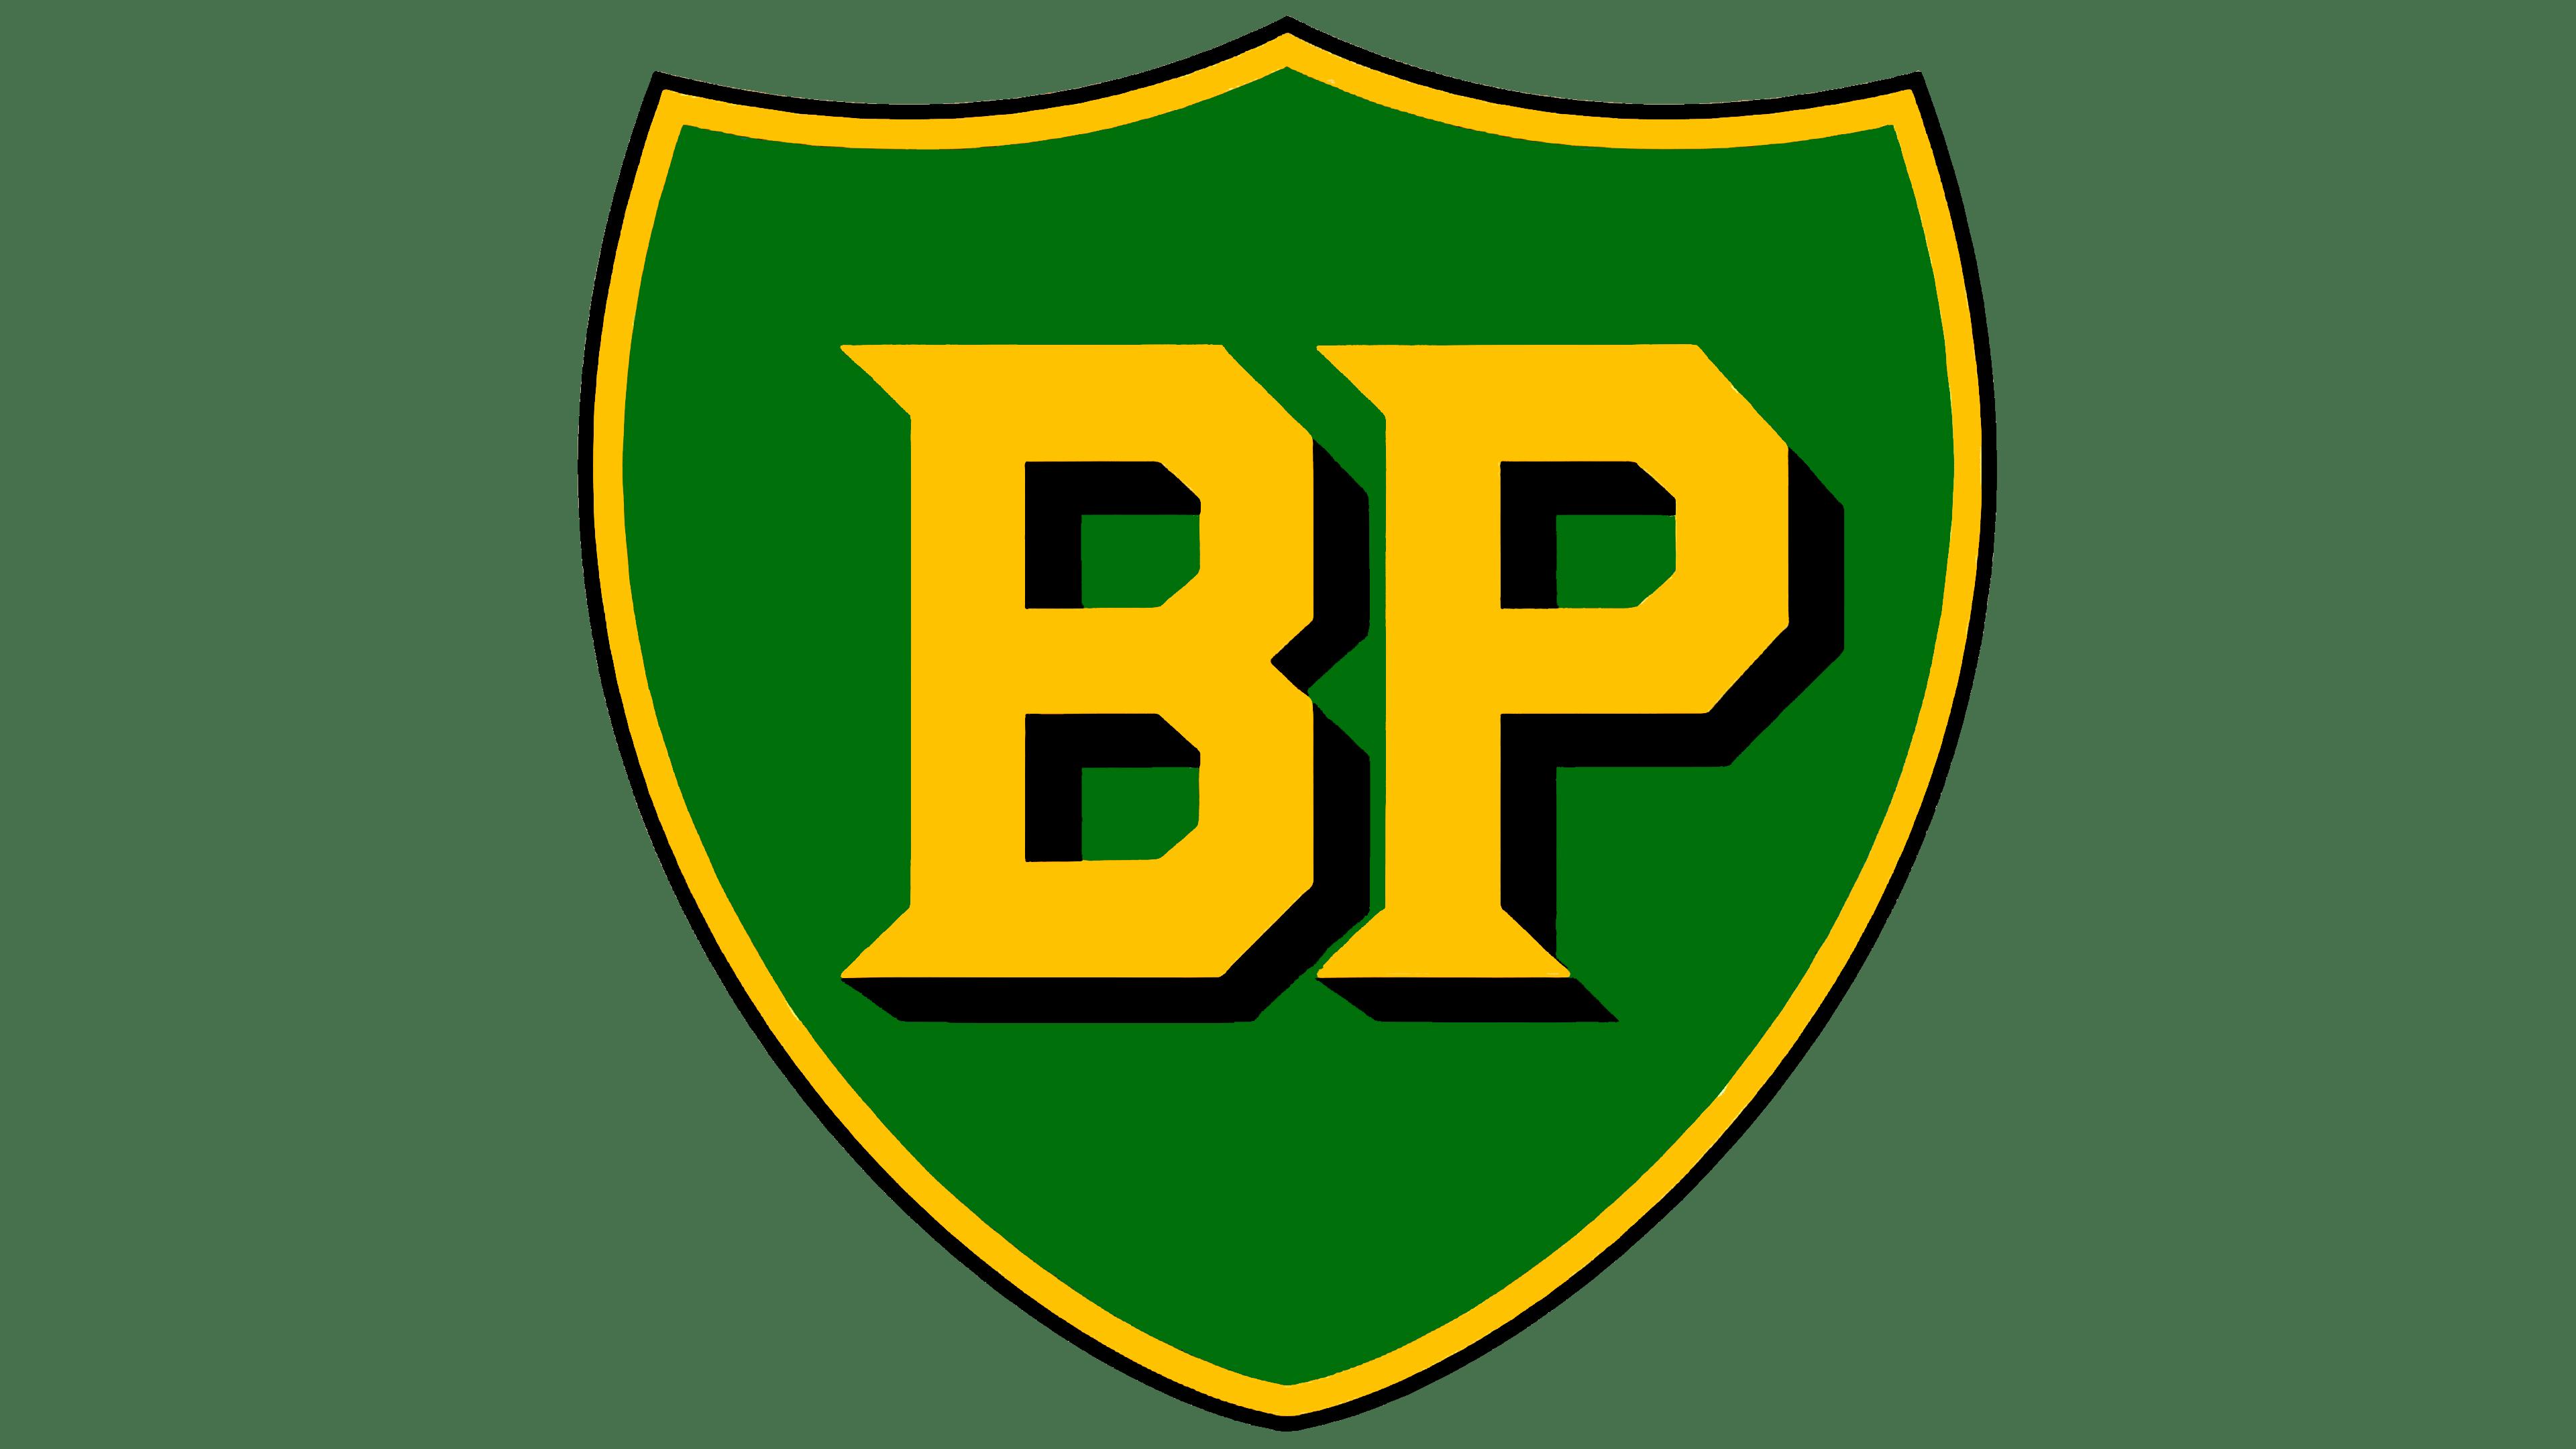 Logo BP 1947 - 1958